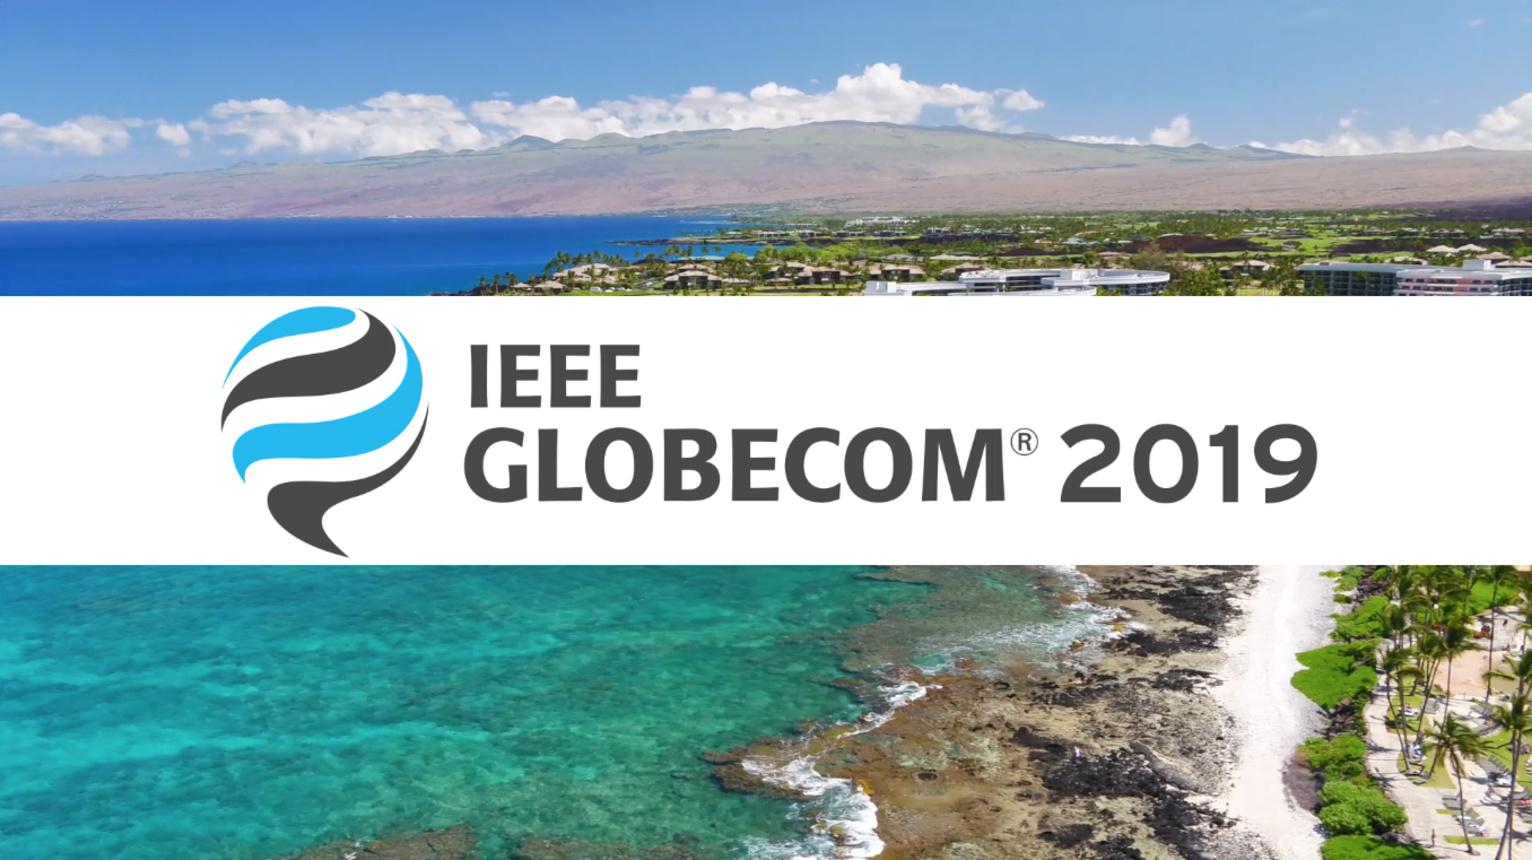 2019 IEEE GLOBECOM | IEEE Global Communications Conference